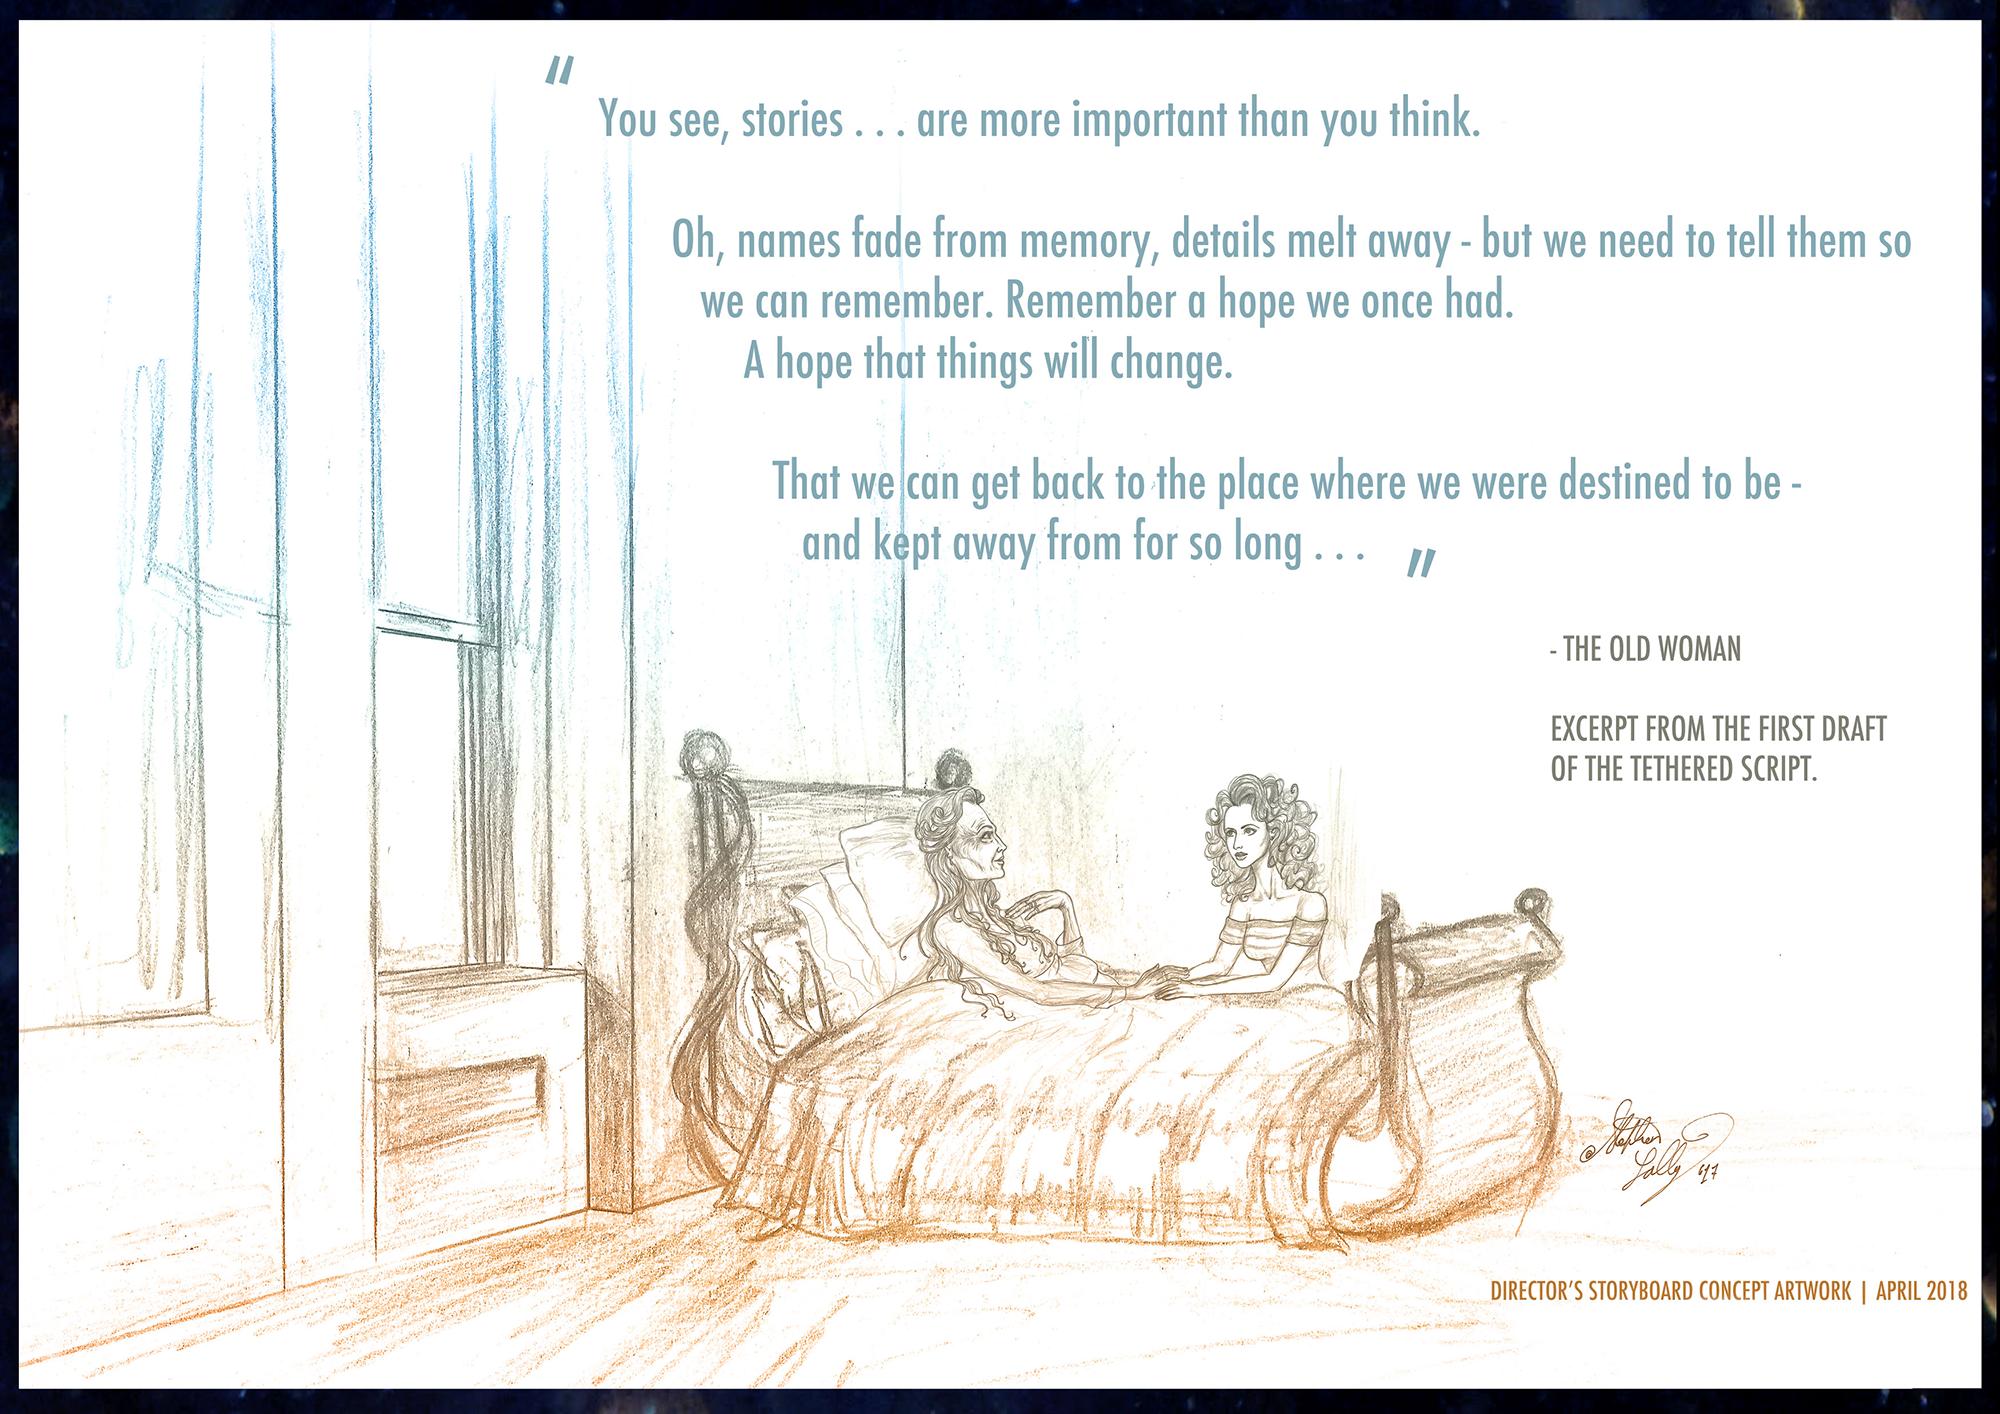 stephen_lally_storyboard_artwork_02.png